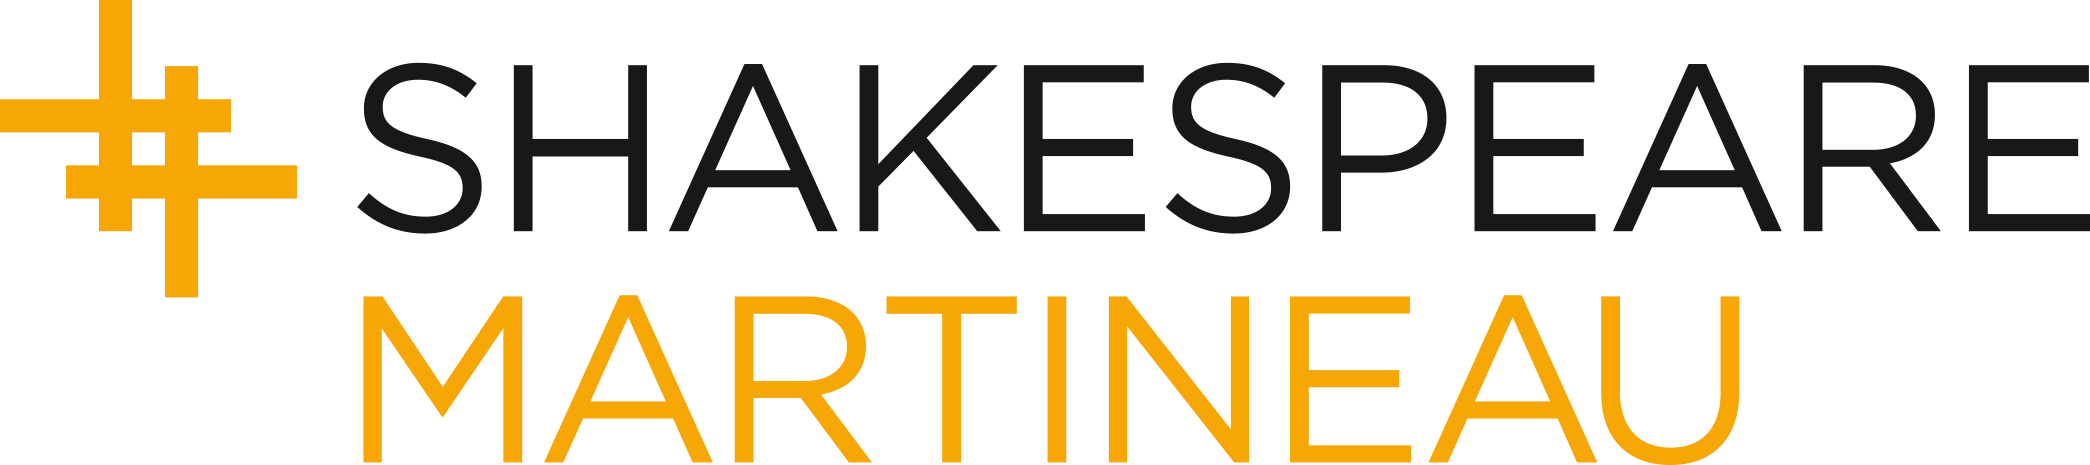 Shakespeare Martineau Logo